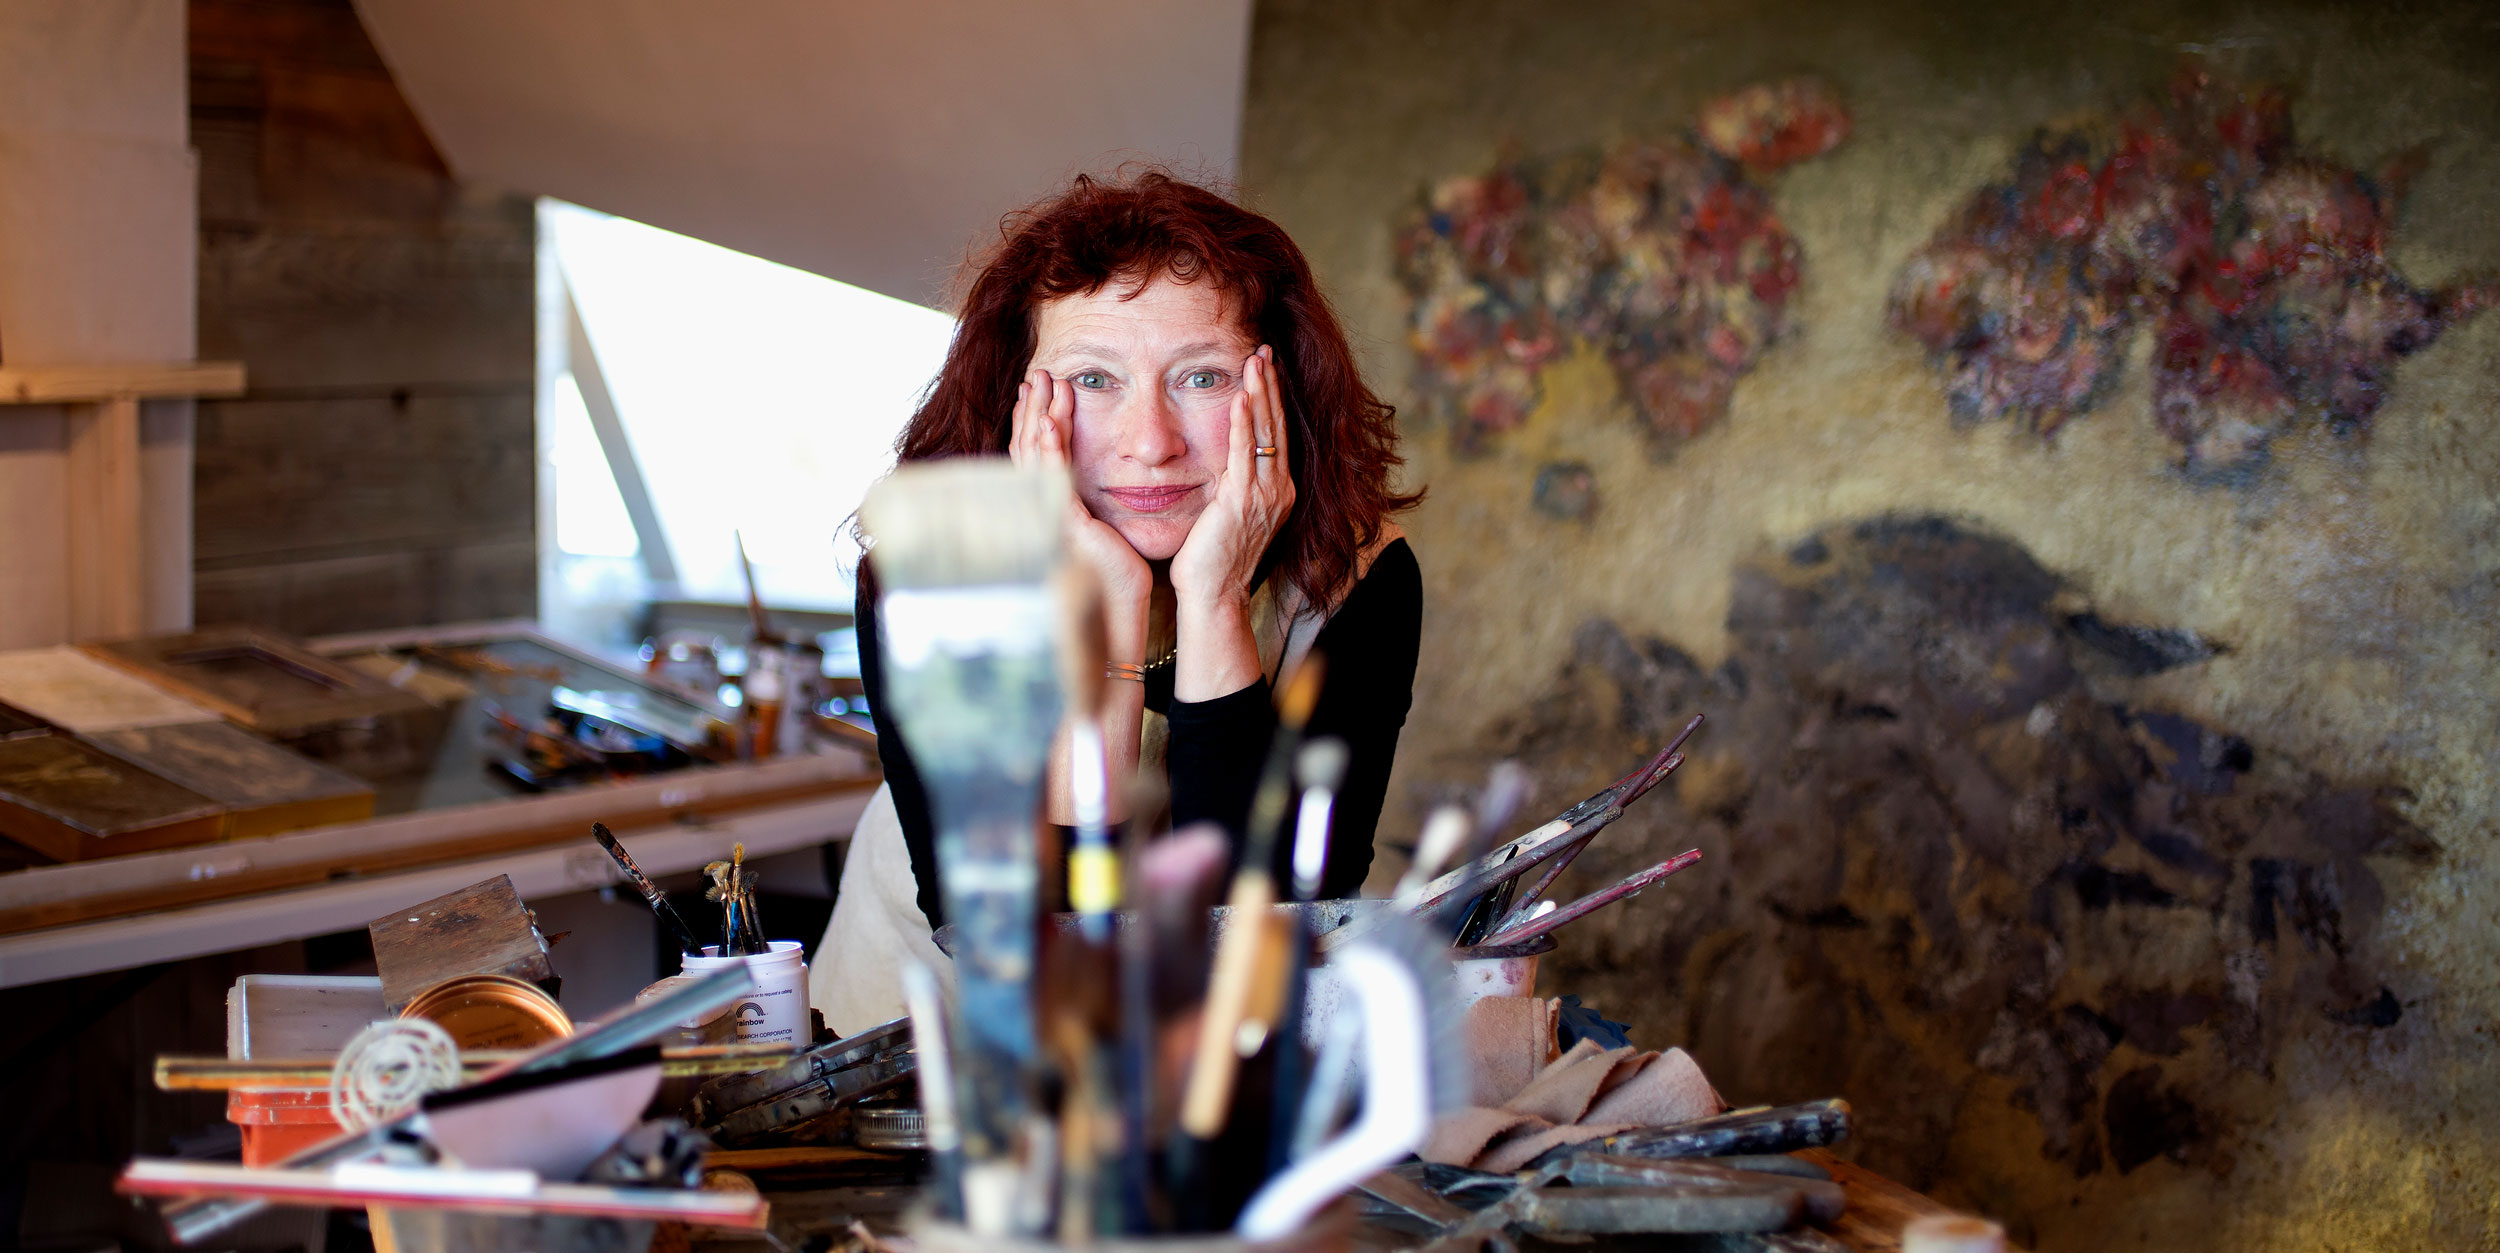 Kathleen-studio-portrait.jpg